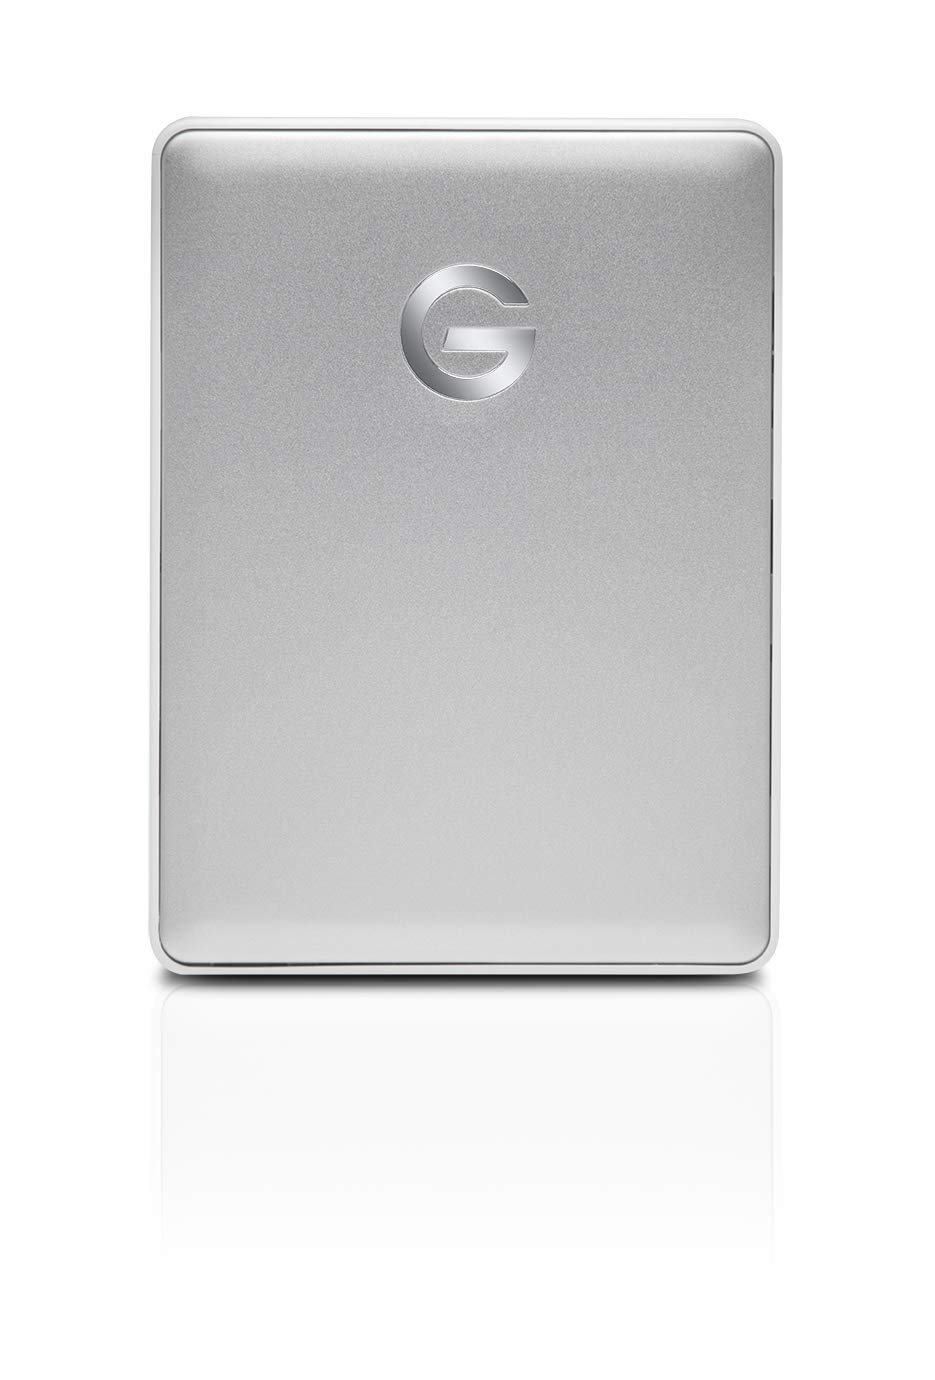 G-Technology 4TB G-DRIVE Mobile USB-C (USB 3.1) Portable External Hard Drive, Silver - 0G10348 by G-Technology